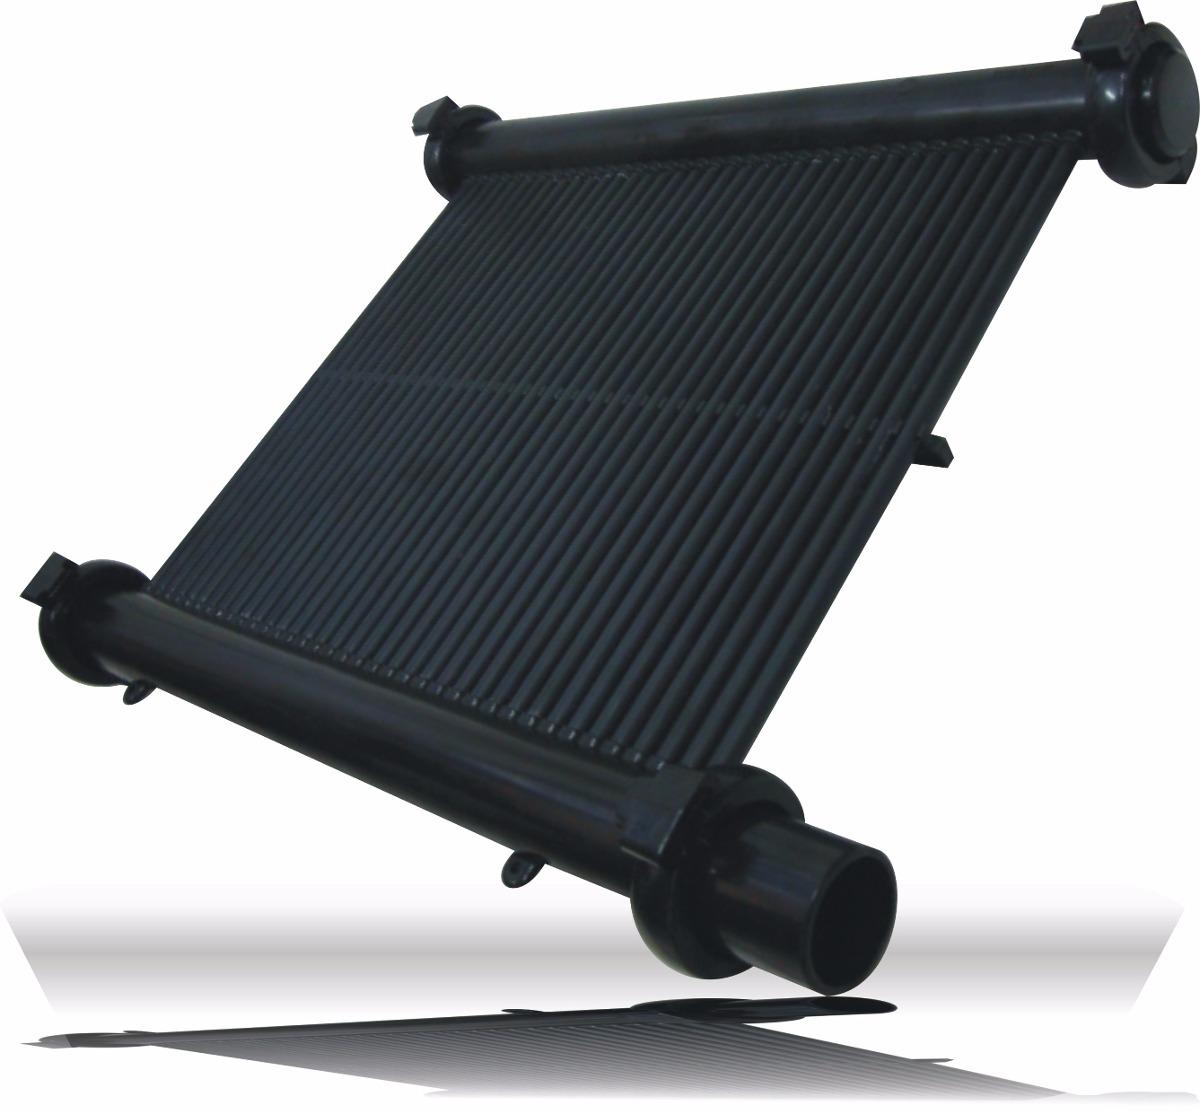 Aquecedor solar p piscina veico 18m placa 3m x 0 50m for Piscina 6 x 3